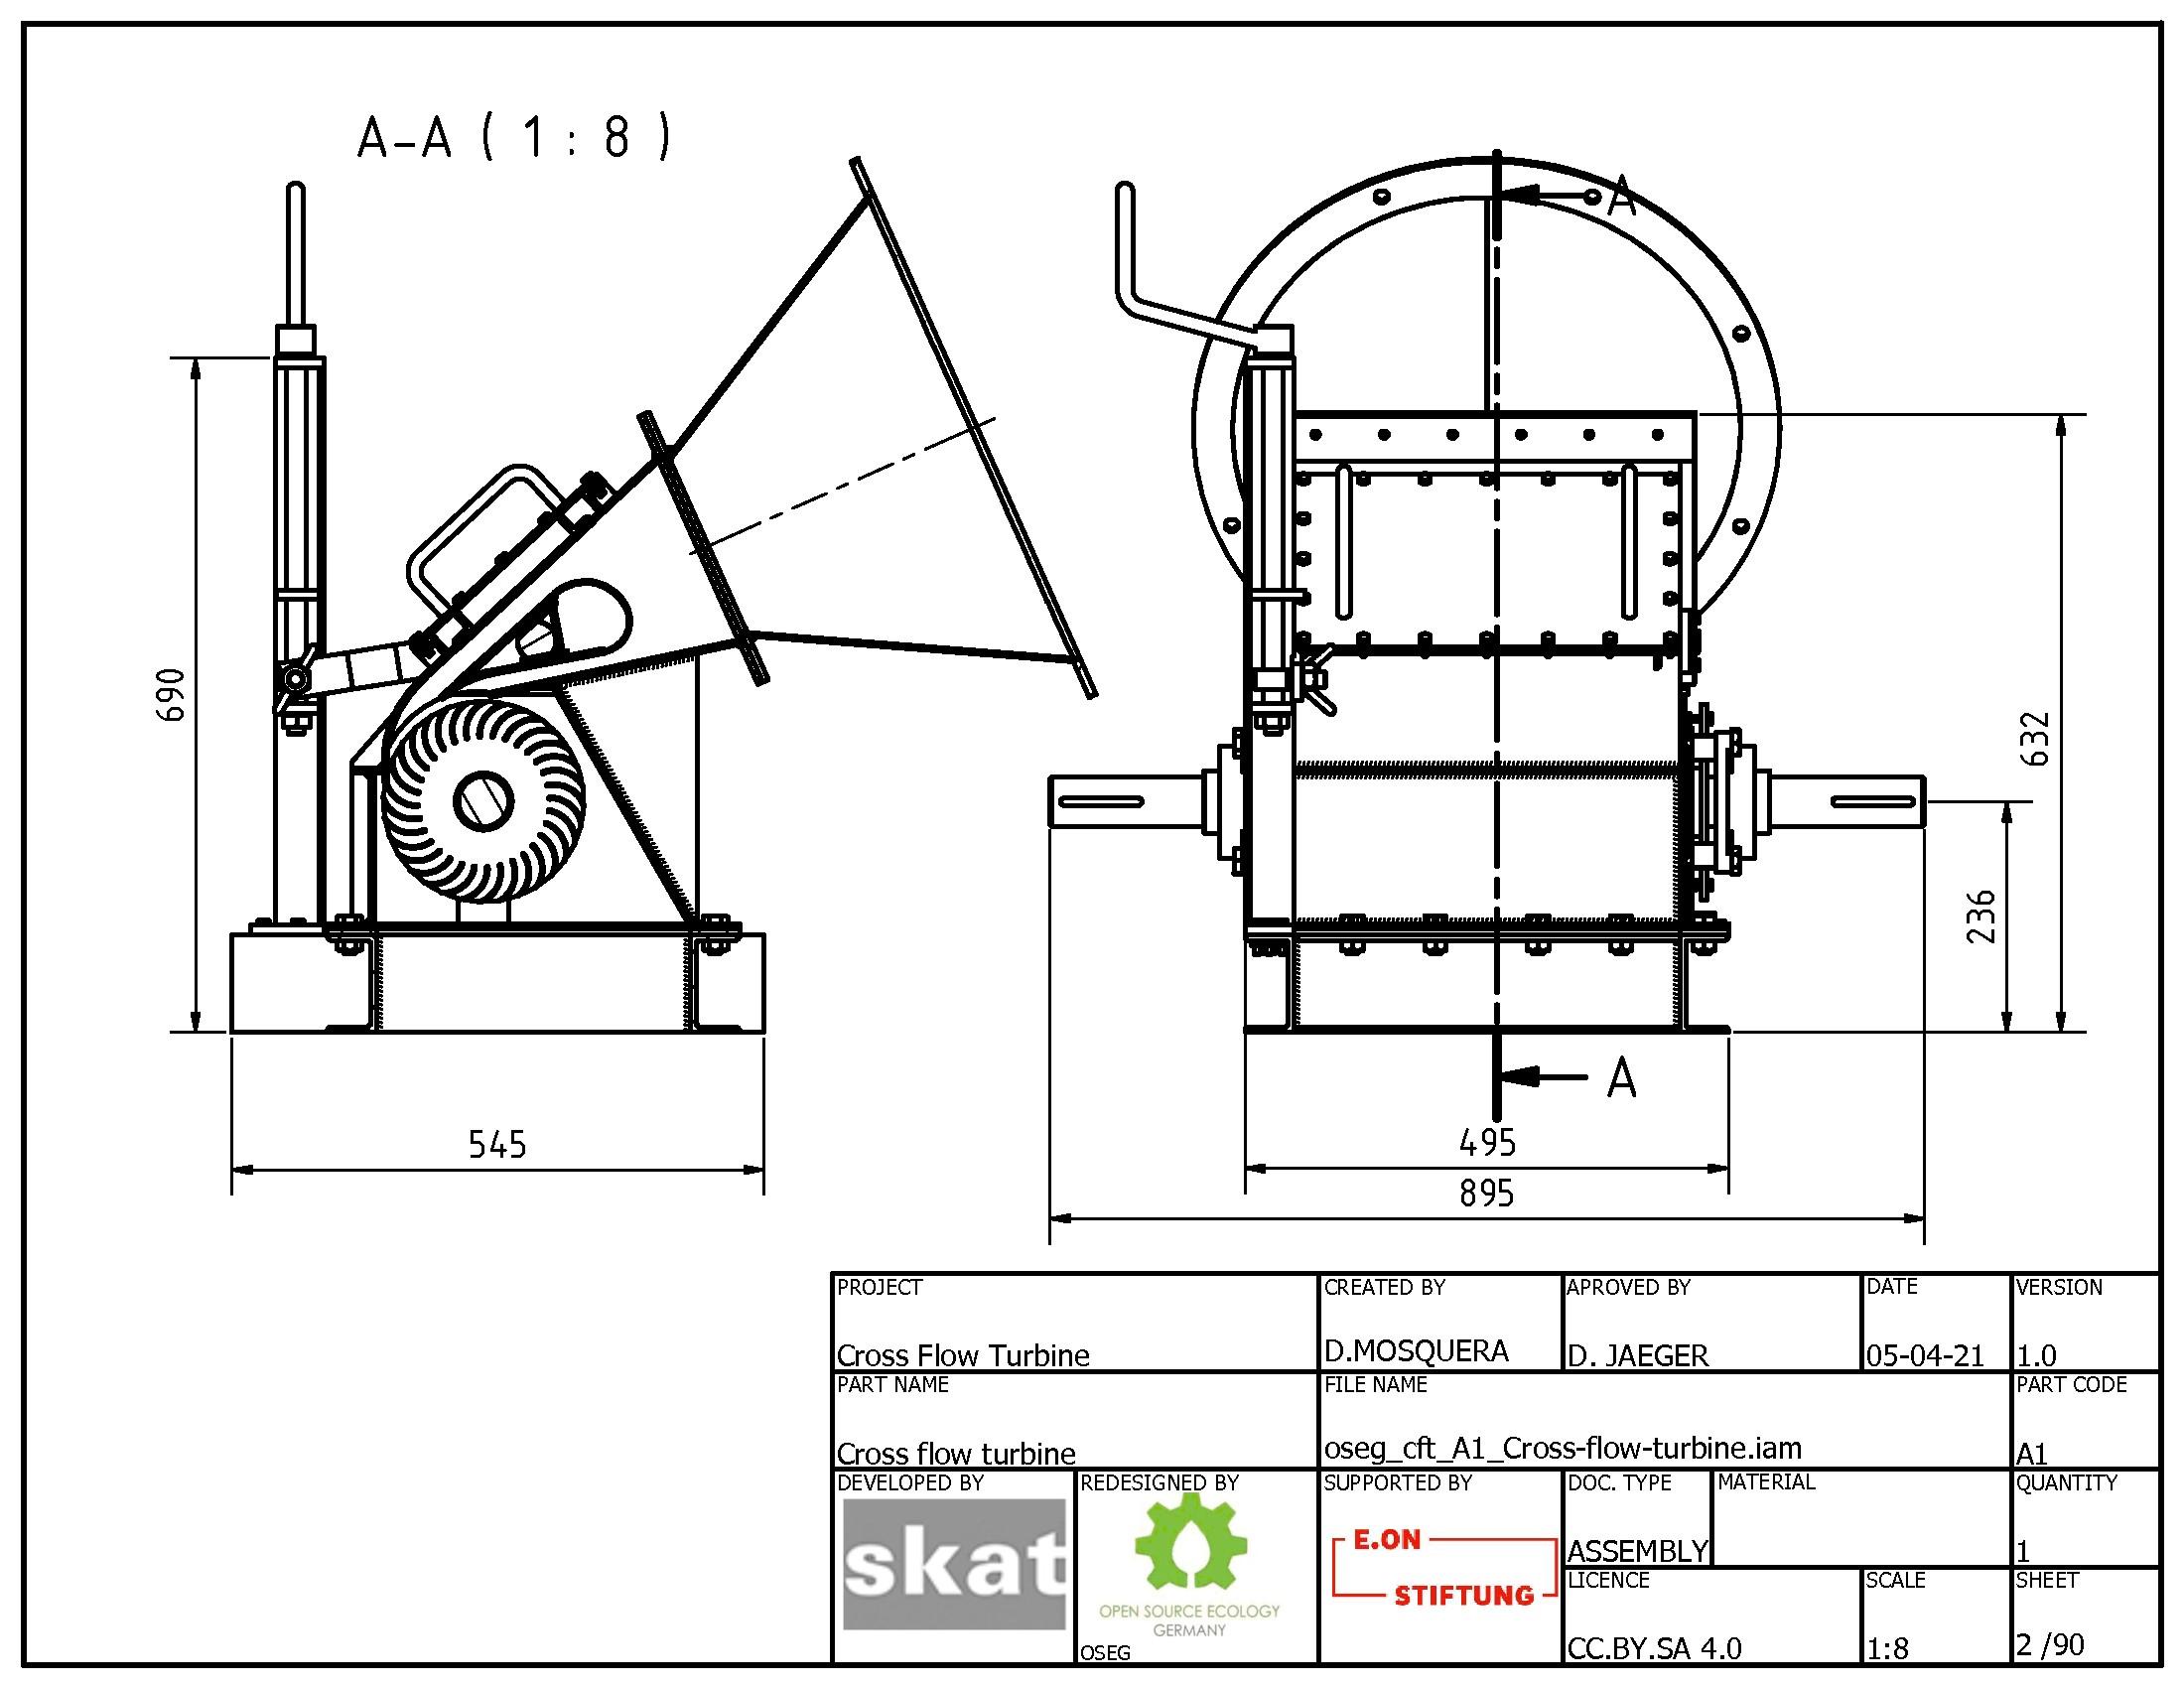 Oseg cft A1 Cross flow turbine 001.jpg